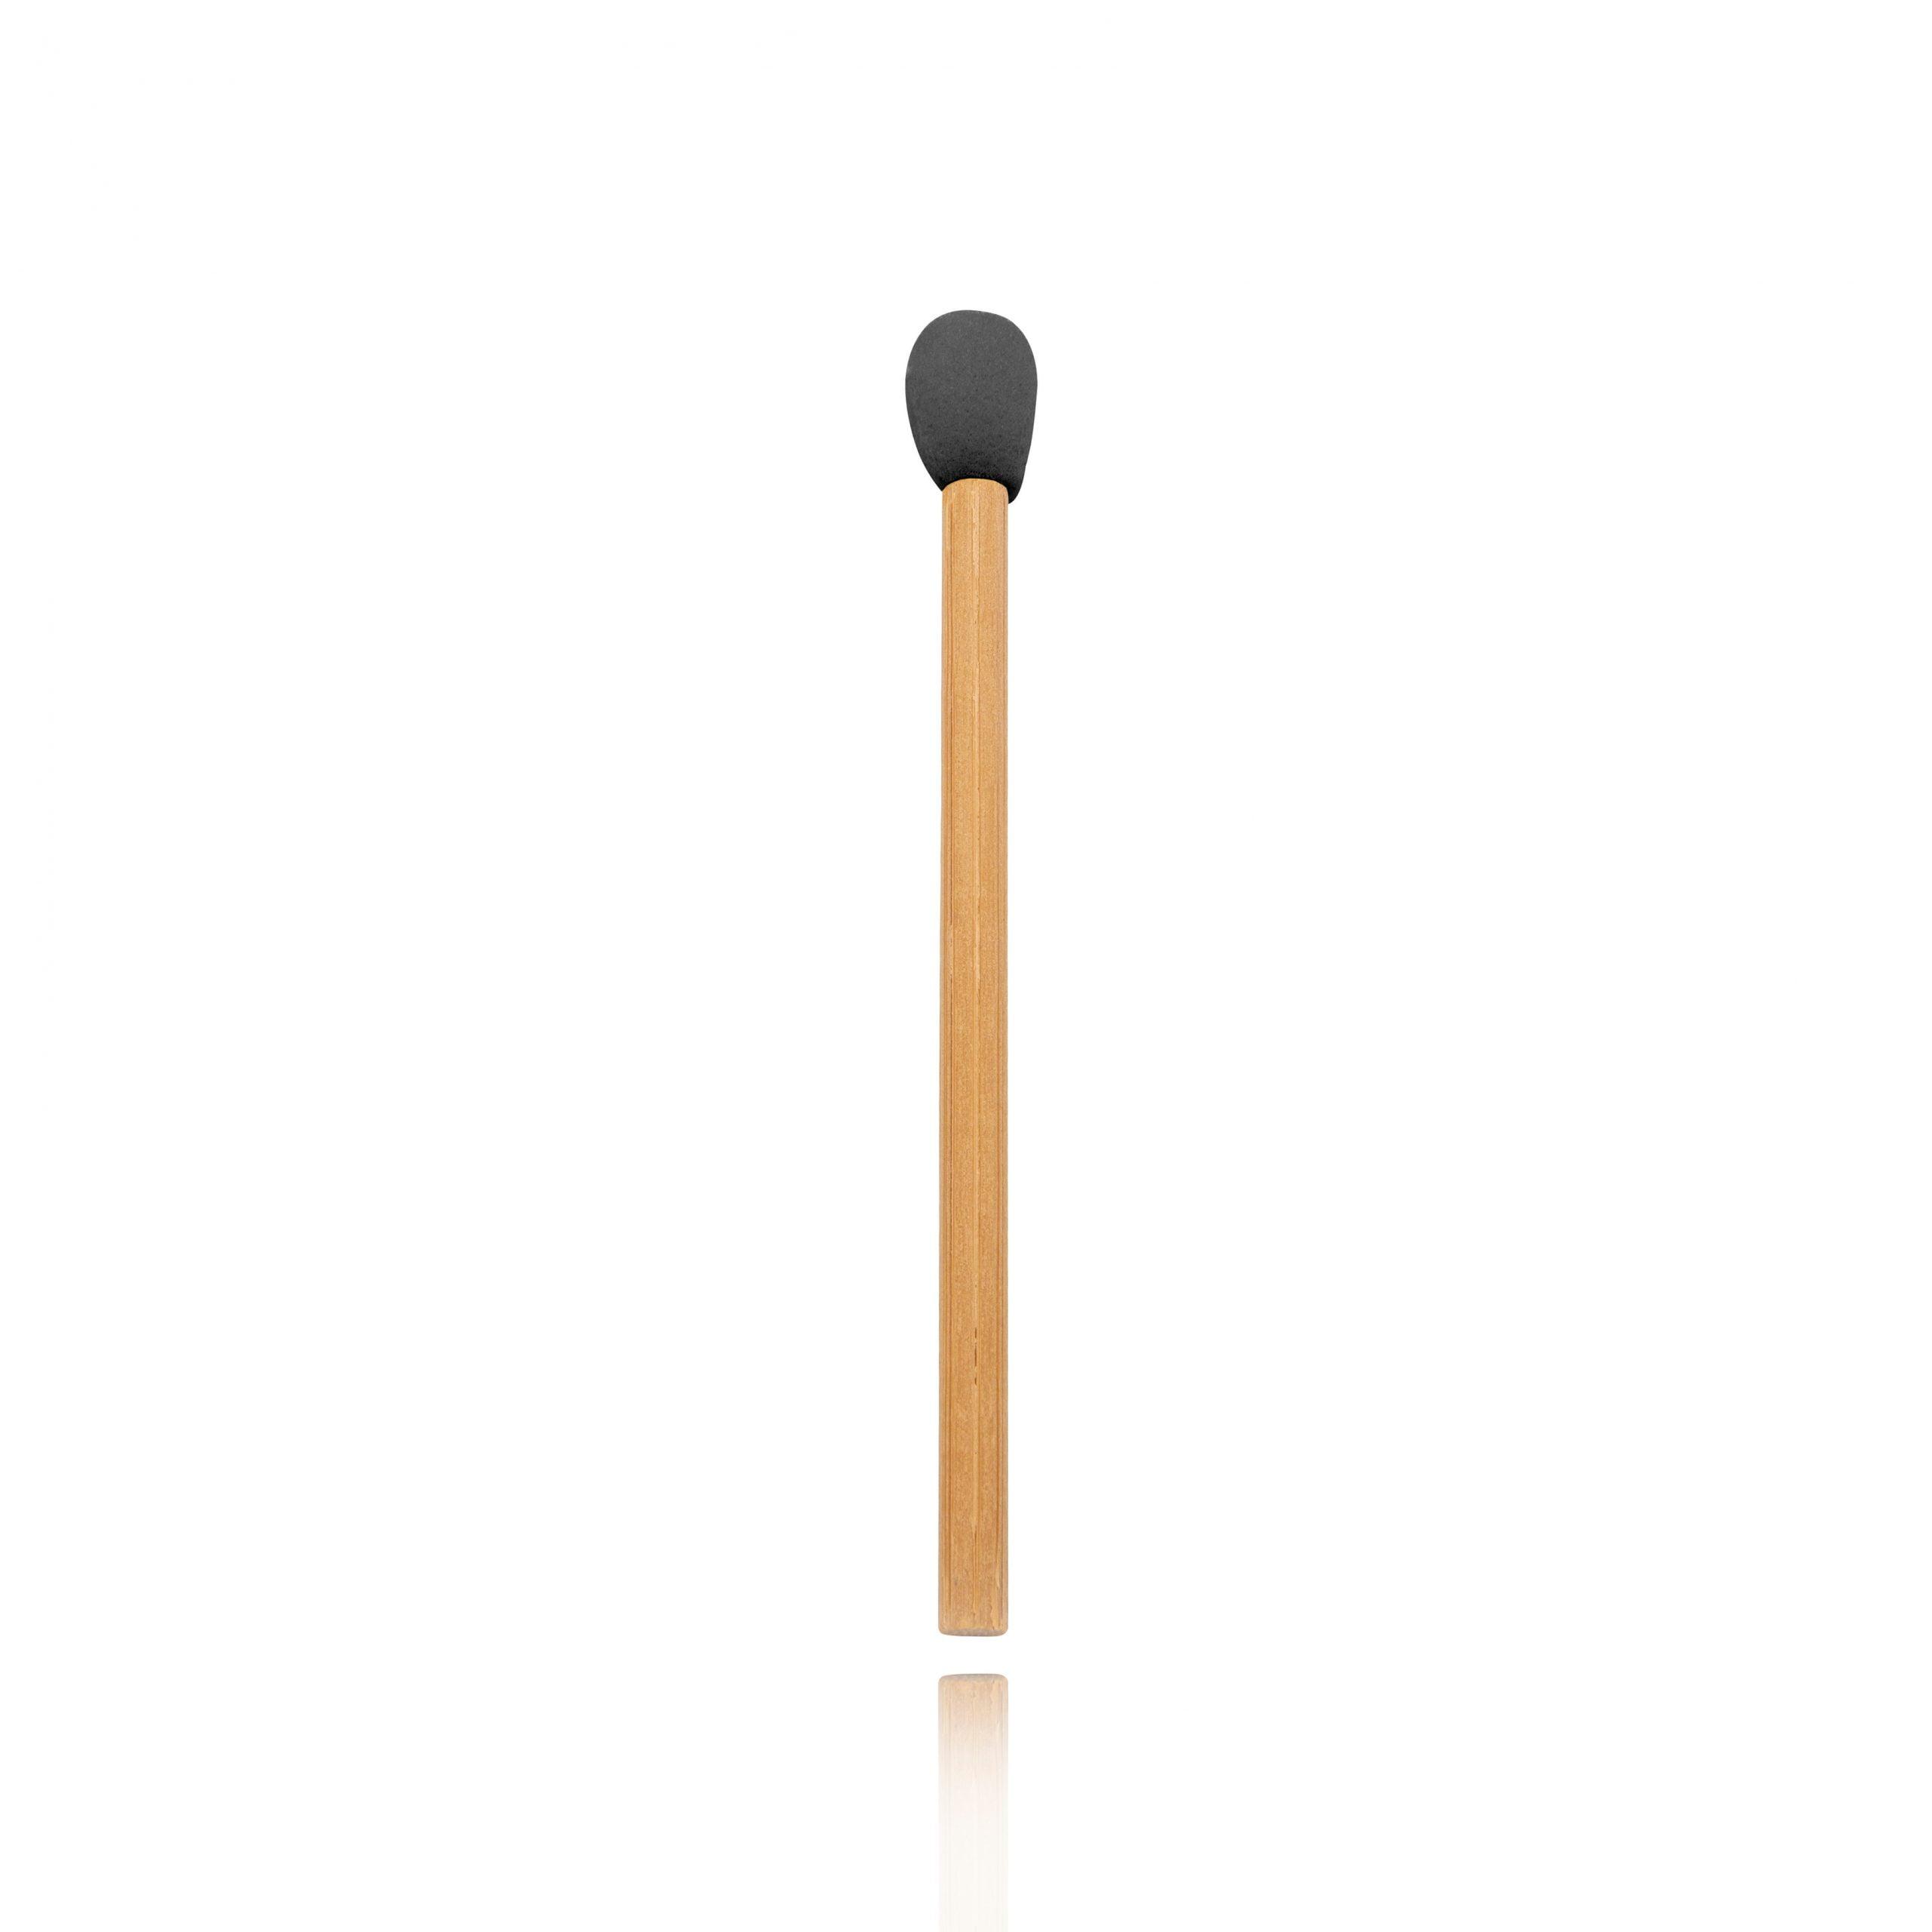 Bamboo Sponge Applicator